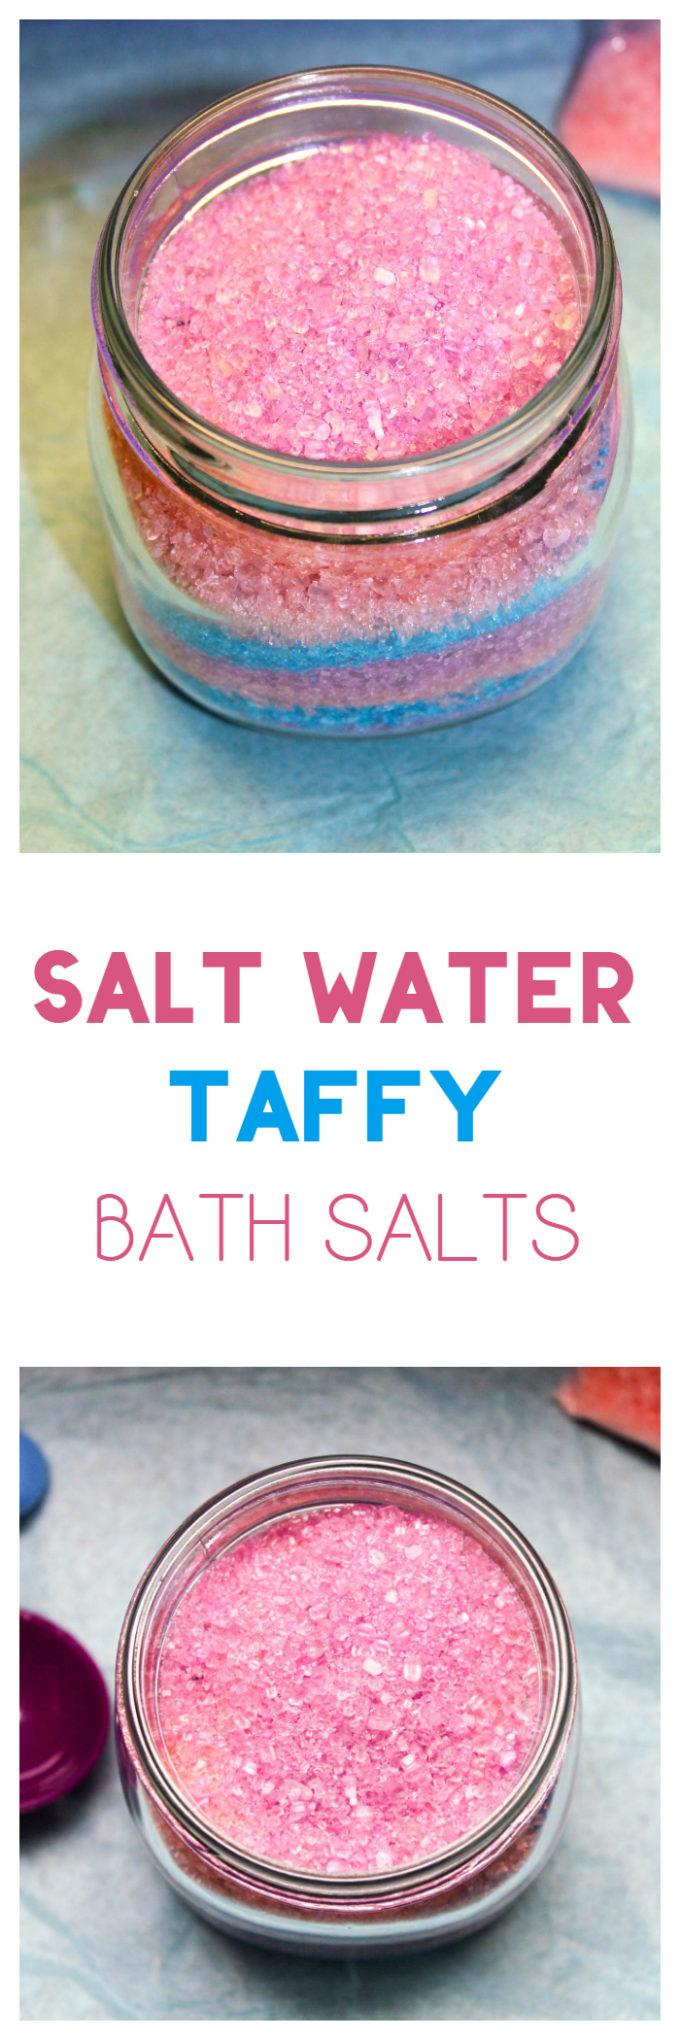 "Orange, Lemon & Vanilla ""Salt Water Taffy"" Bath Salts Recipe"